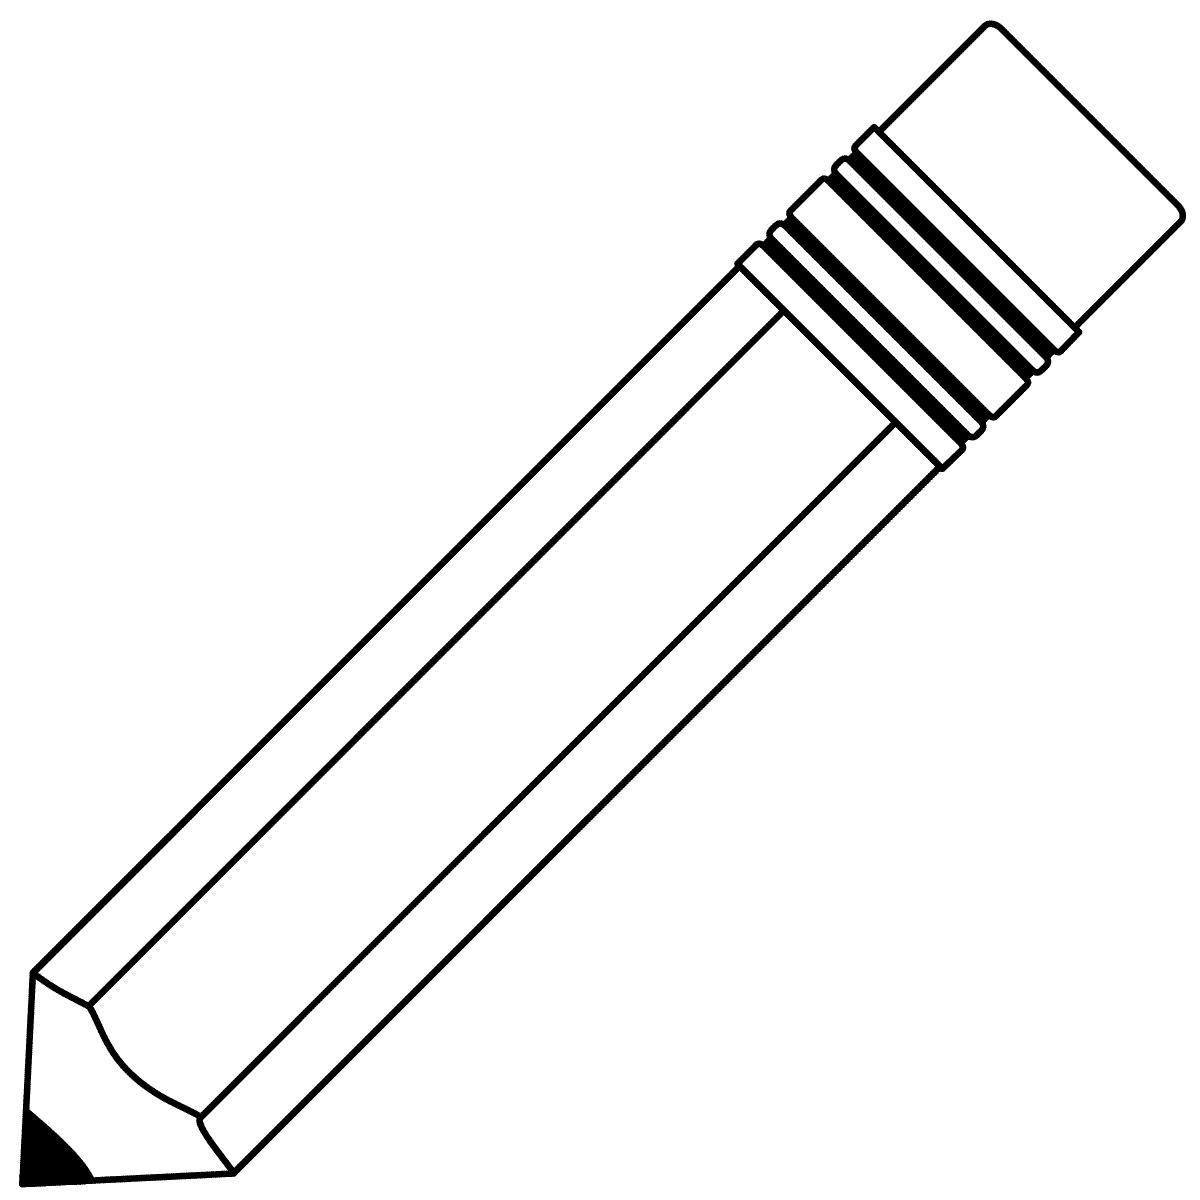 11 Velowatt Bonneville additionally 1723 also Kleurplaat php together with Symbole additionally 8873683174216623594. on faq